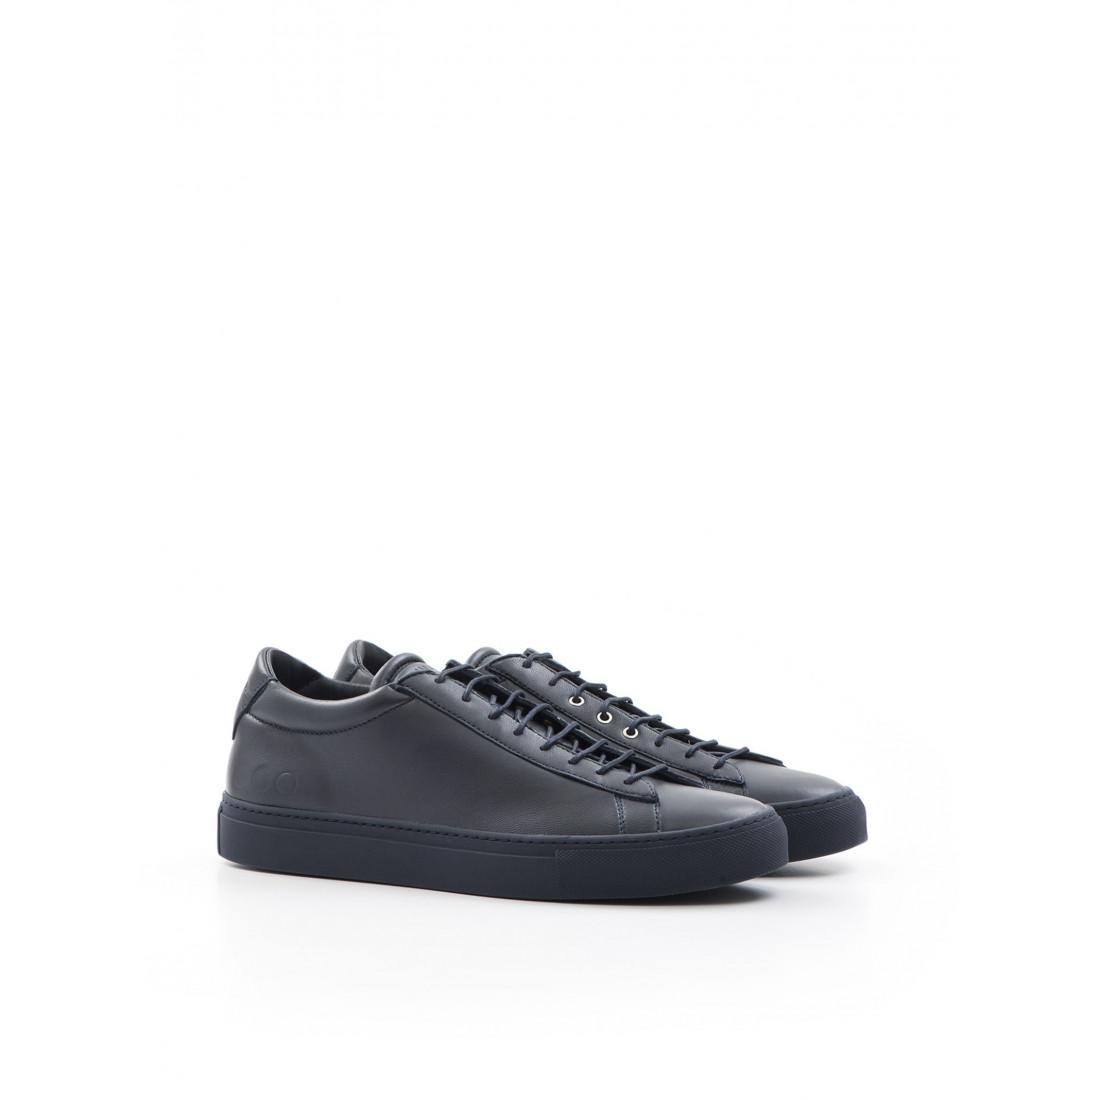 sneakers uomo primaforma 1pf7f0017p blue navy